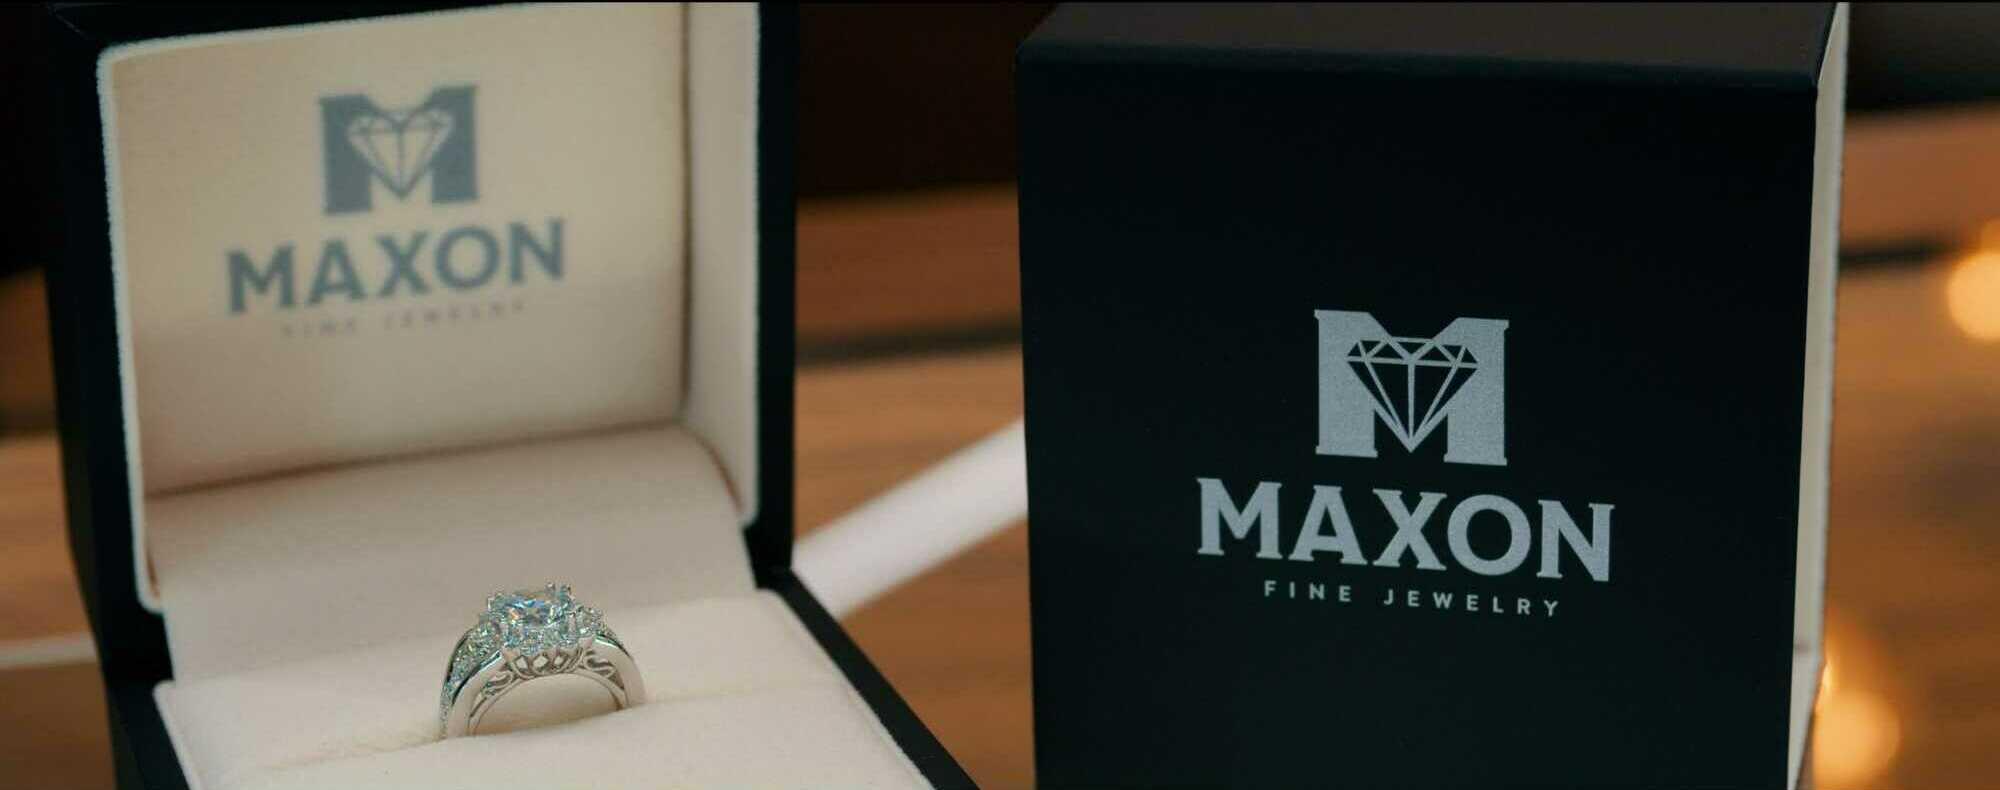 maxon-jewelry-springfield-mo